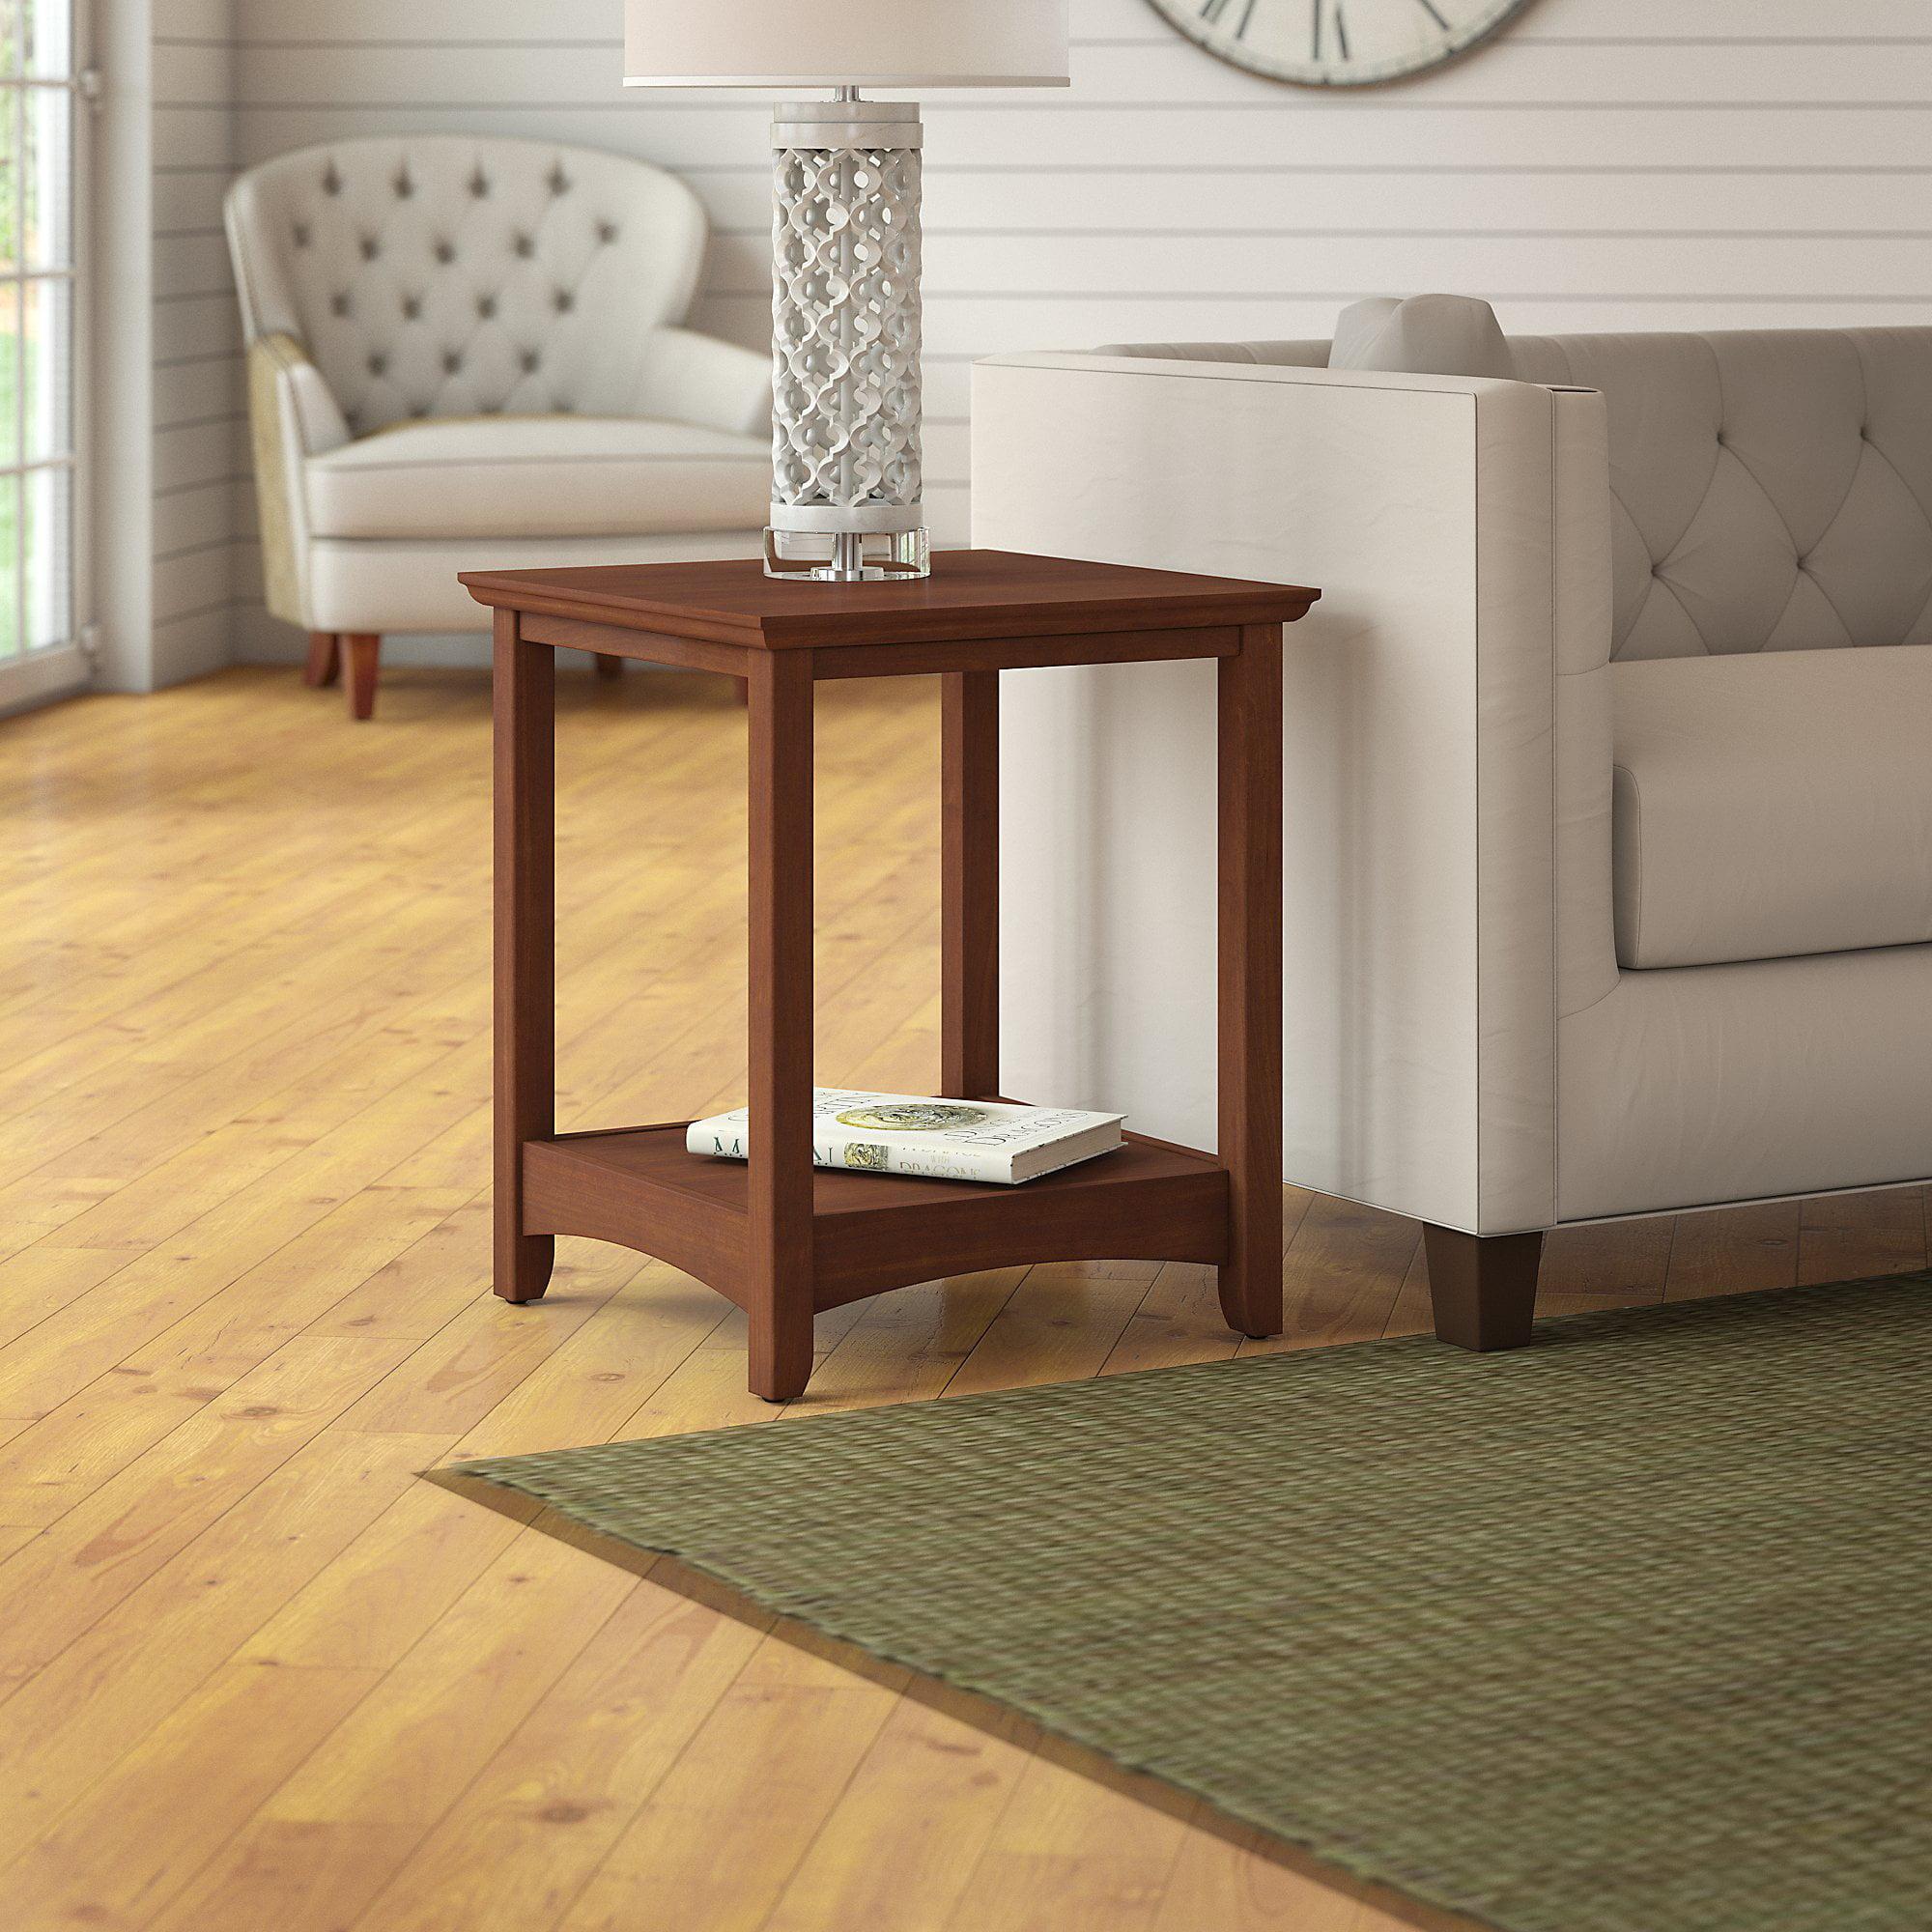 Bush Furniture Buena Vista End Tables Set of 2 in Serene Cherry